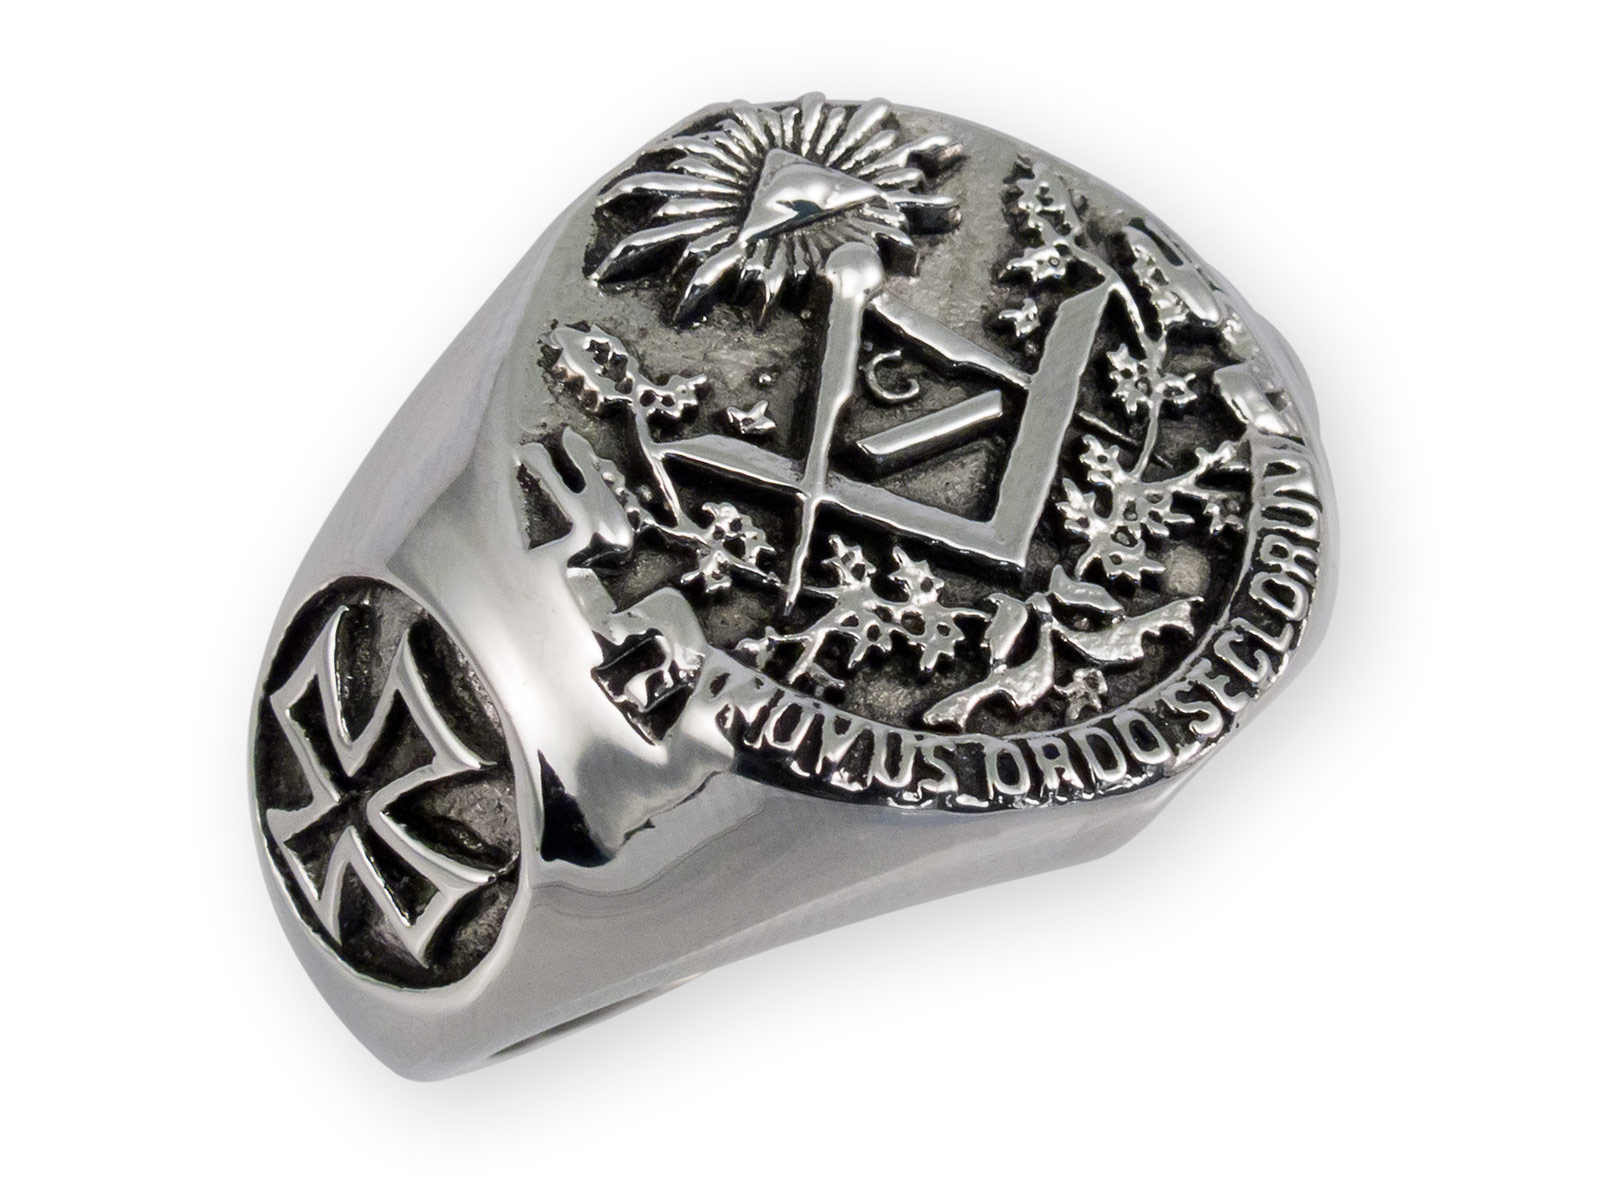 Masonic / Illuminati Signet Stainless Steel Ring